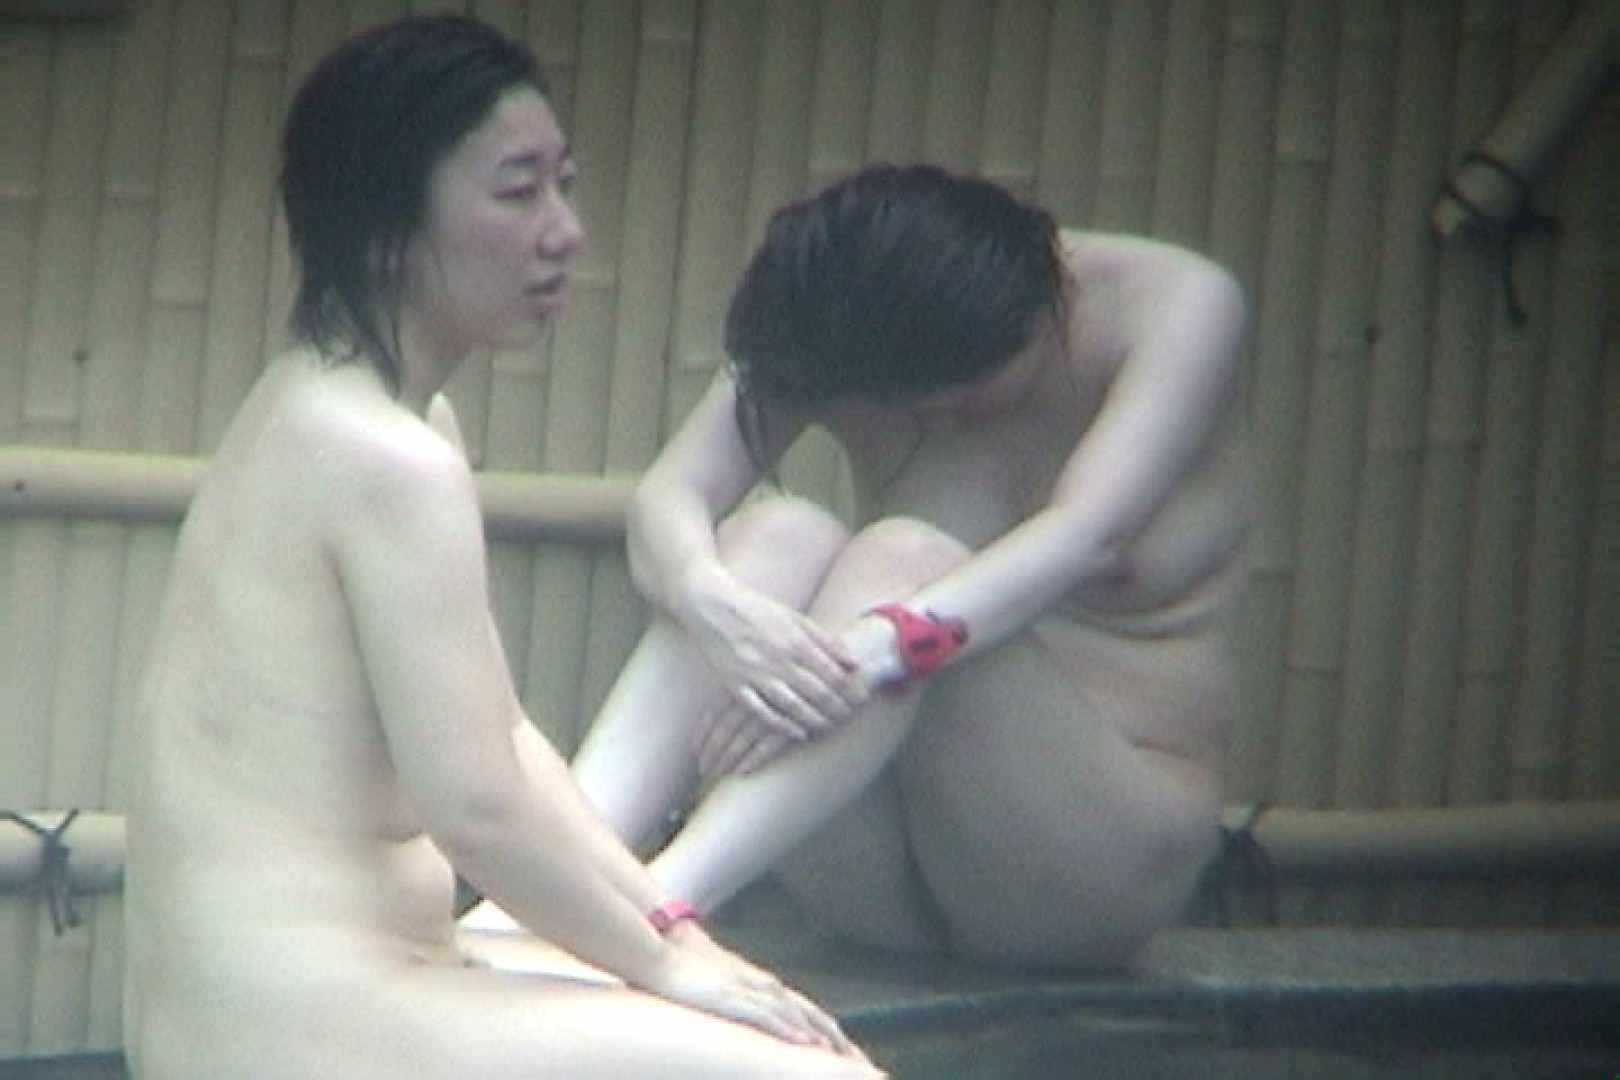 Aquaな露天風呂Vol.107 OLセックス 隠し撮りオマンコ動画紹介 63画像 11